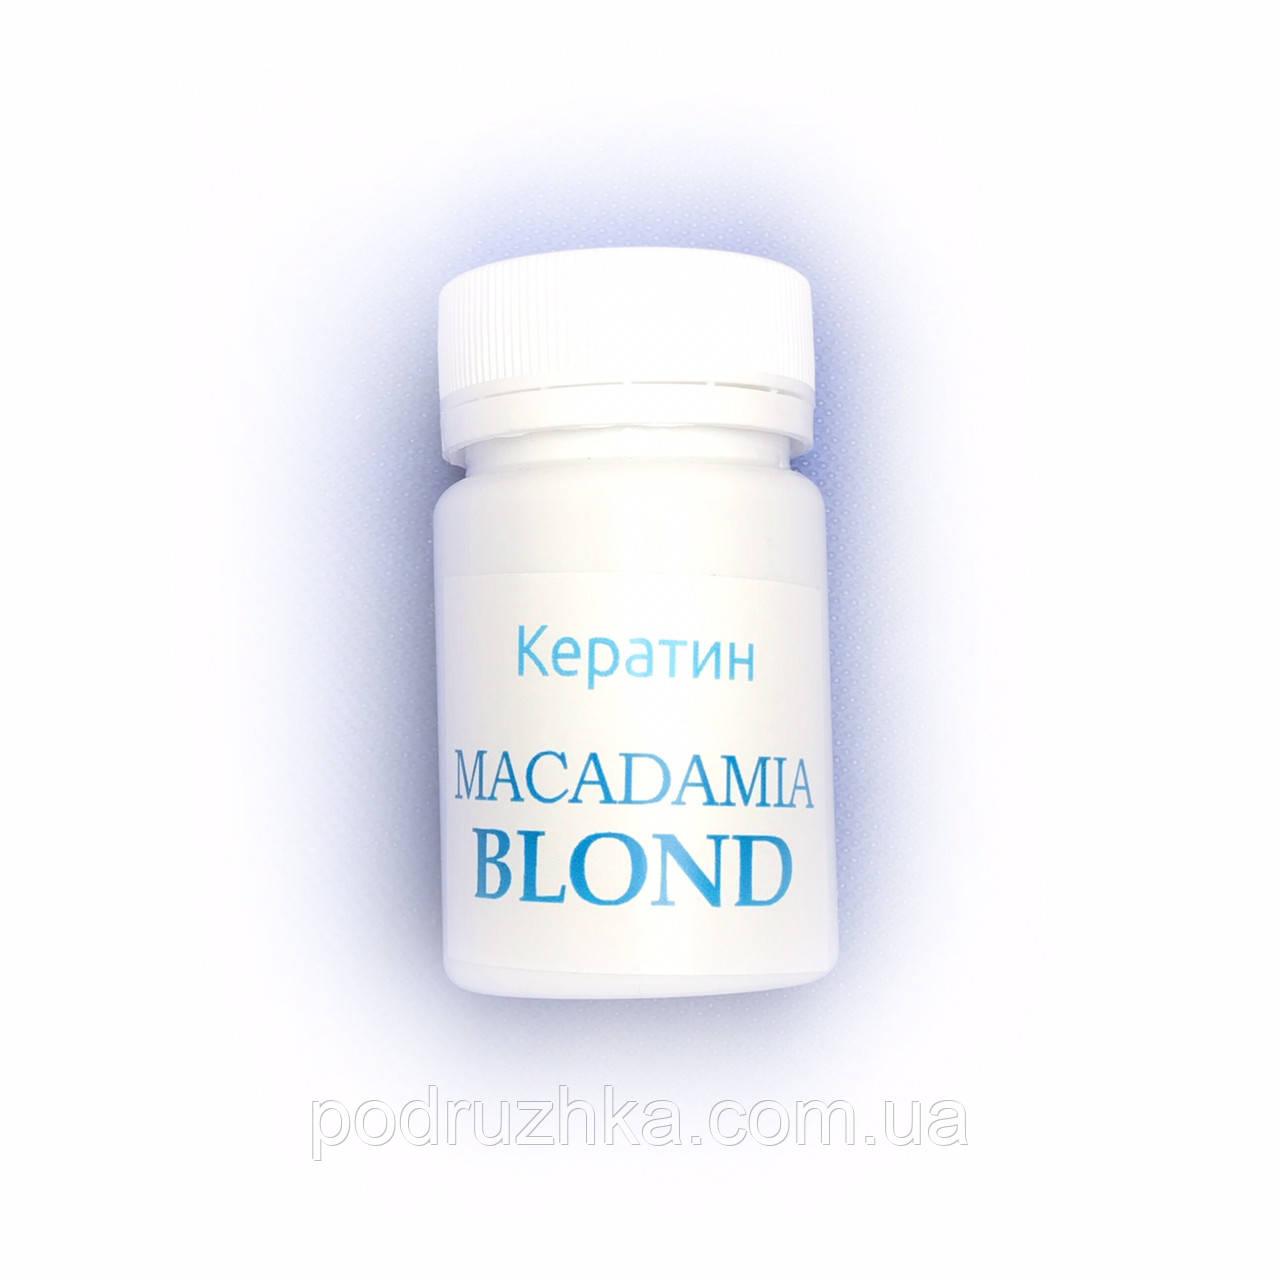 Кератин для волос Macadamia Ultimate Blond (шаг 2) 500 г